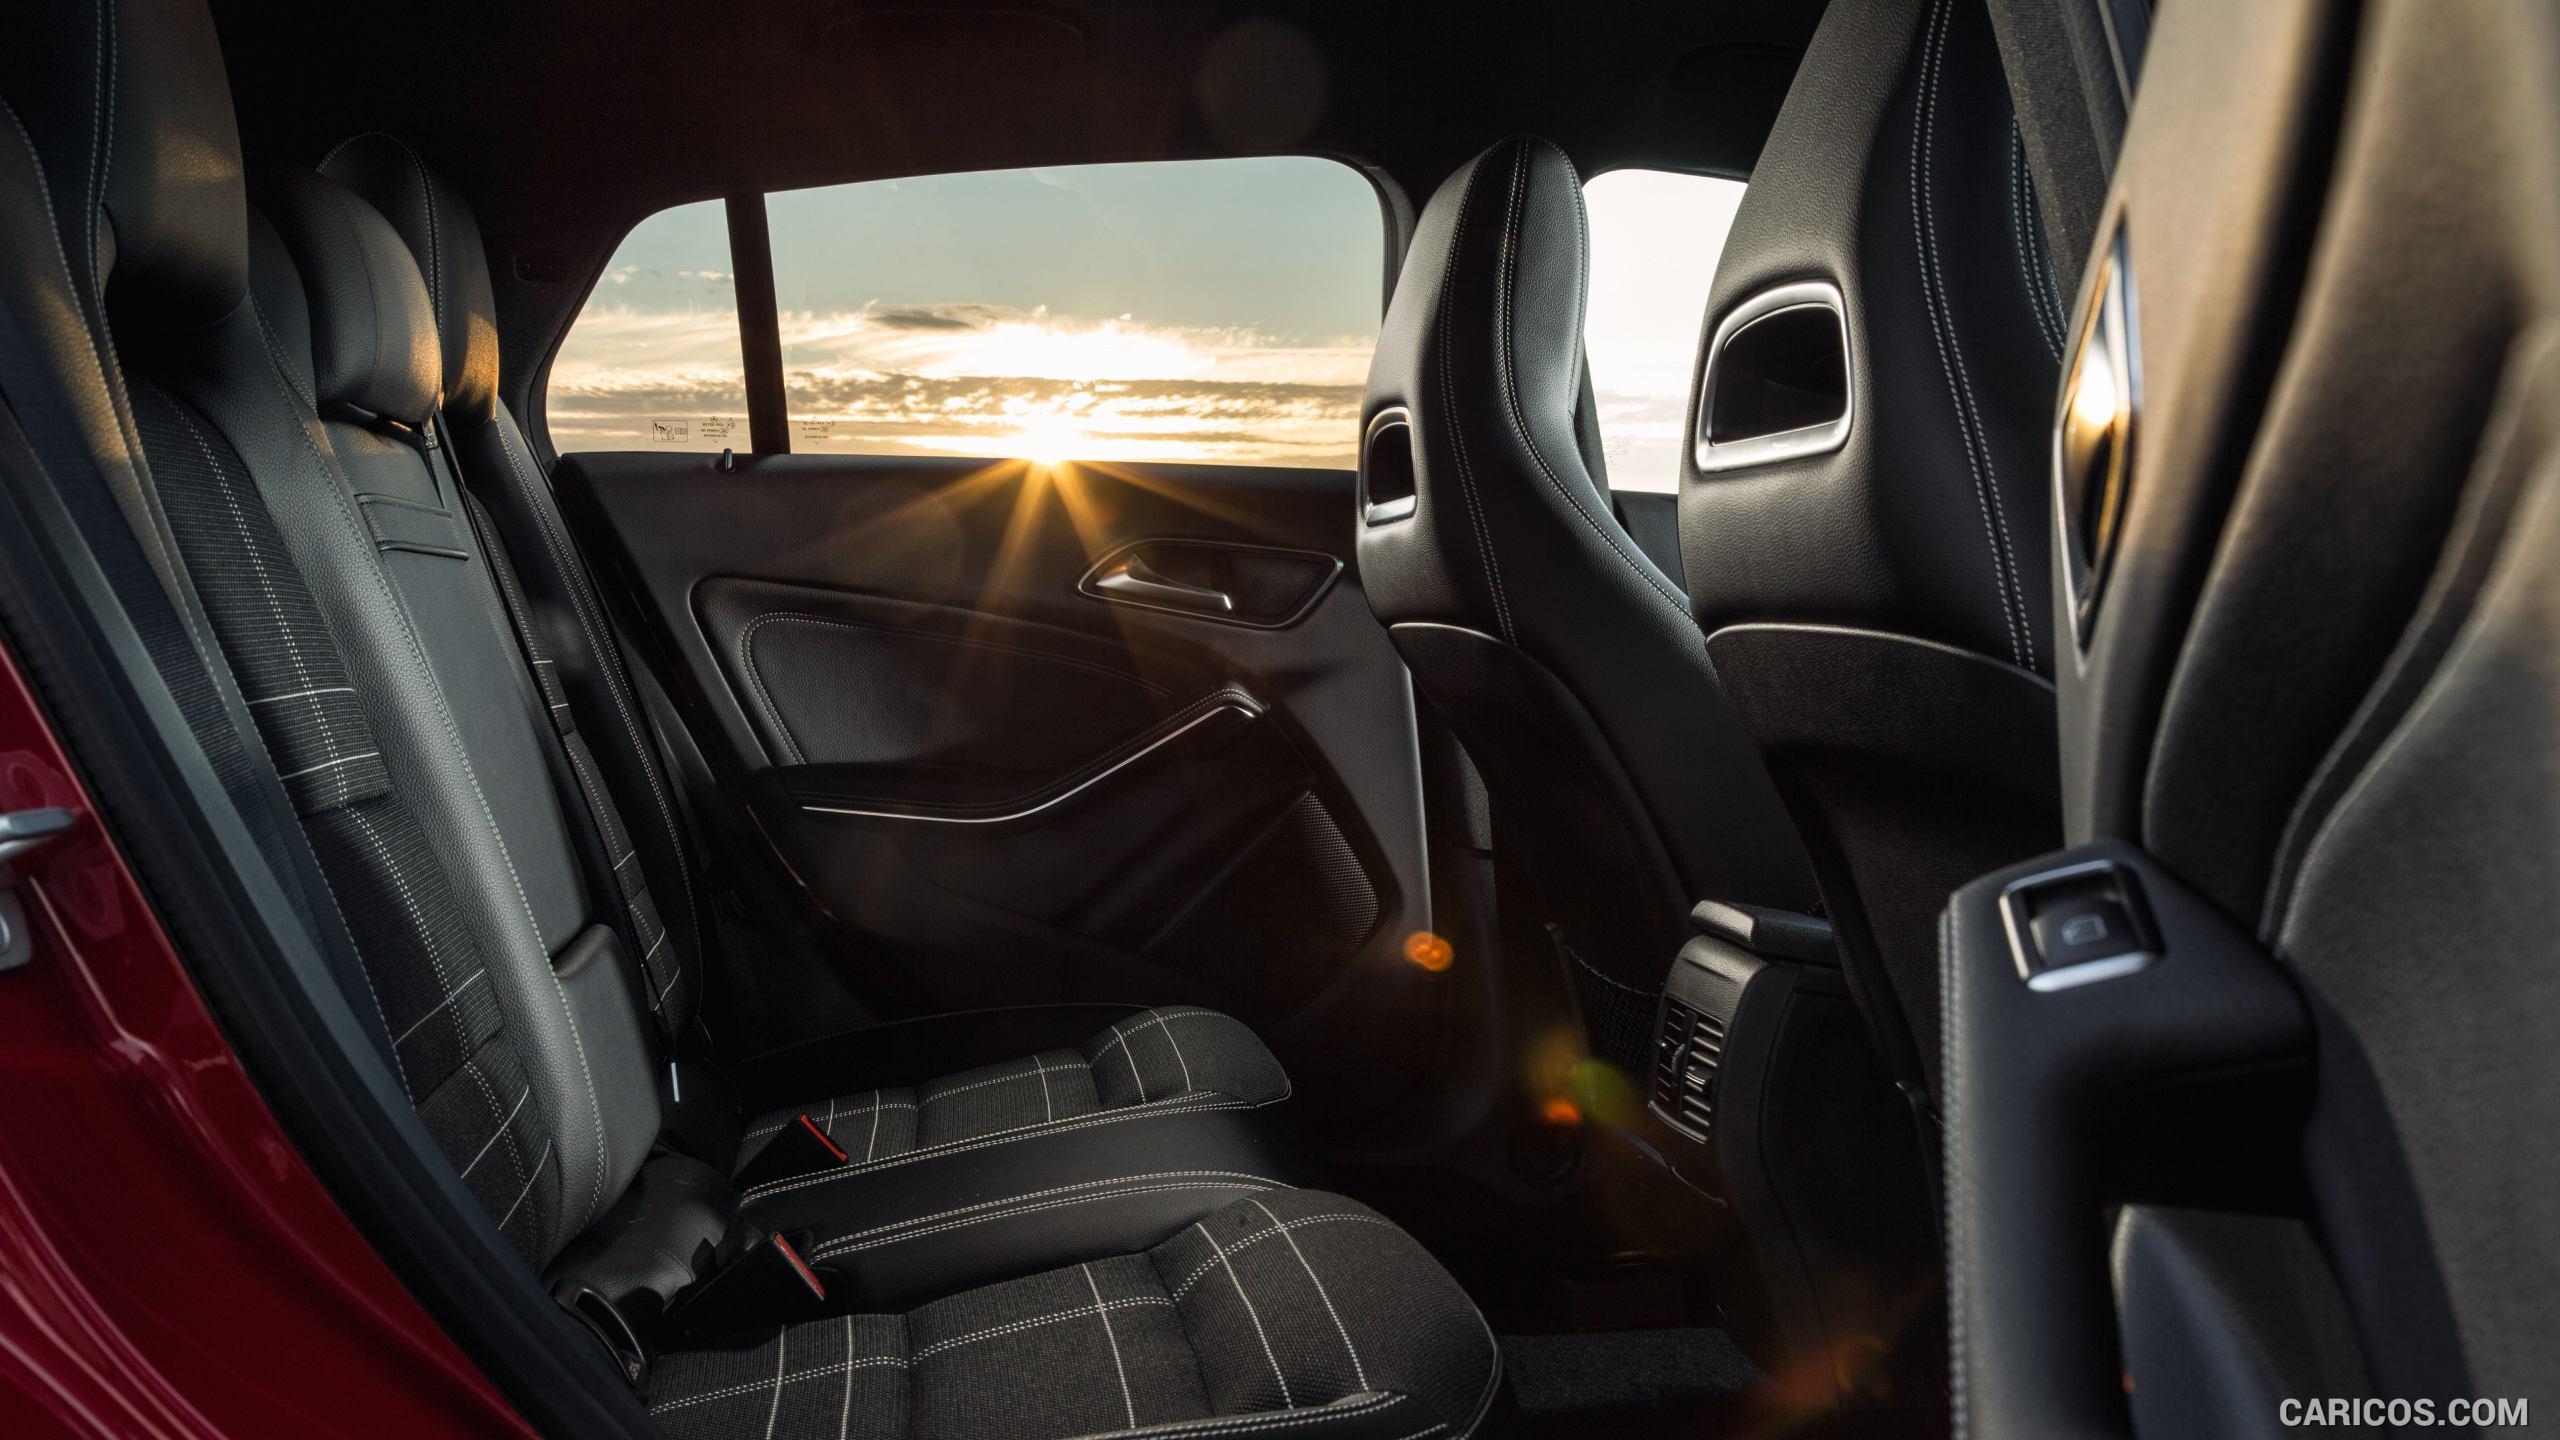 2015 Mercedes Benz CLA 200 CDI Shooting Brake UK Spec   Interior 2560x1440